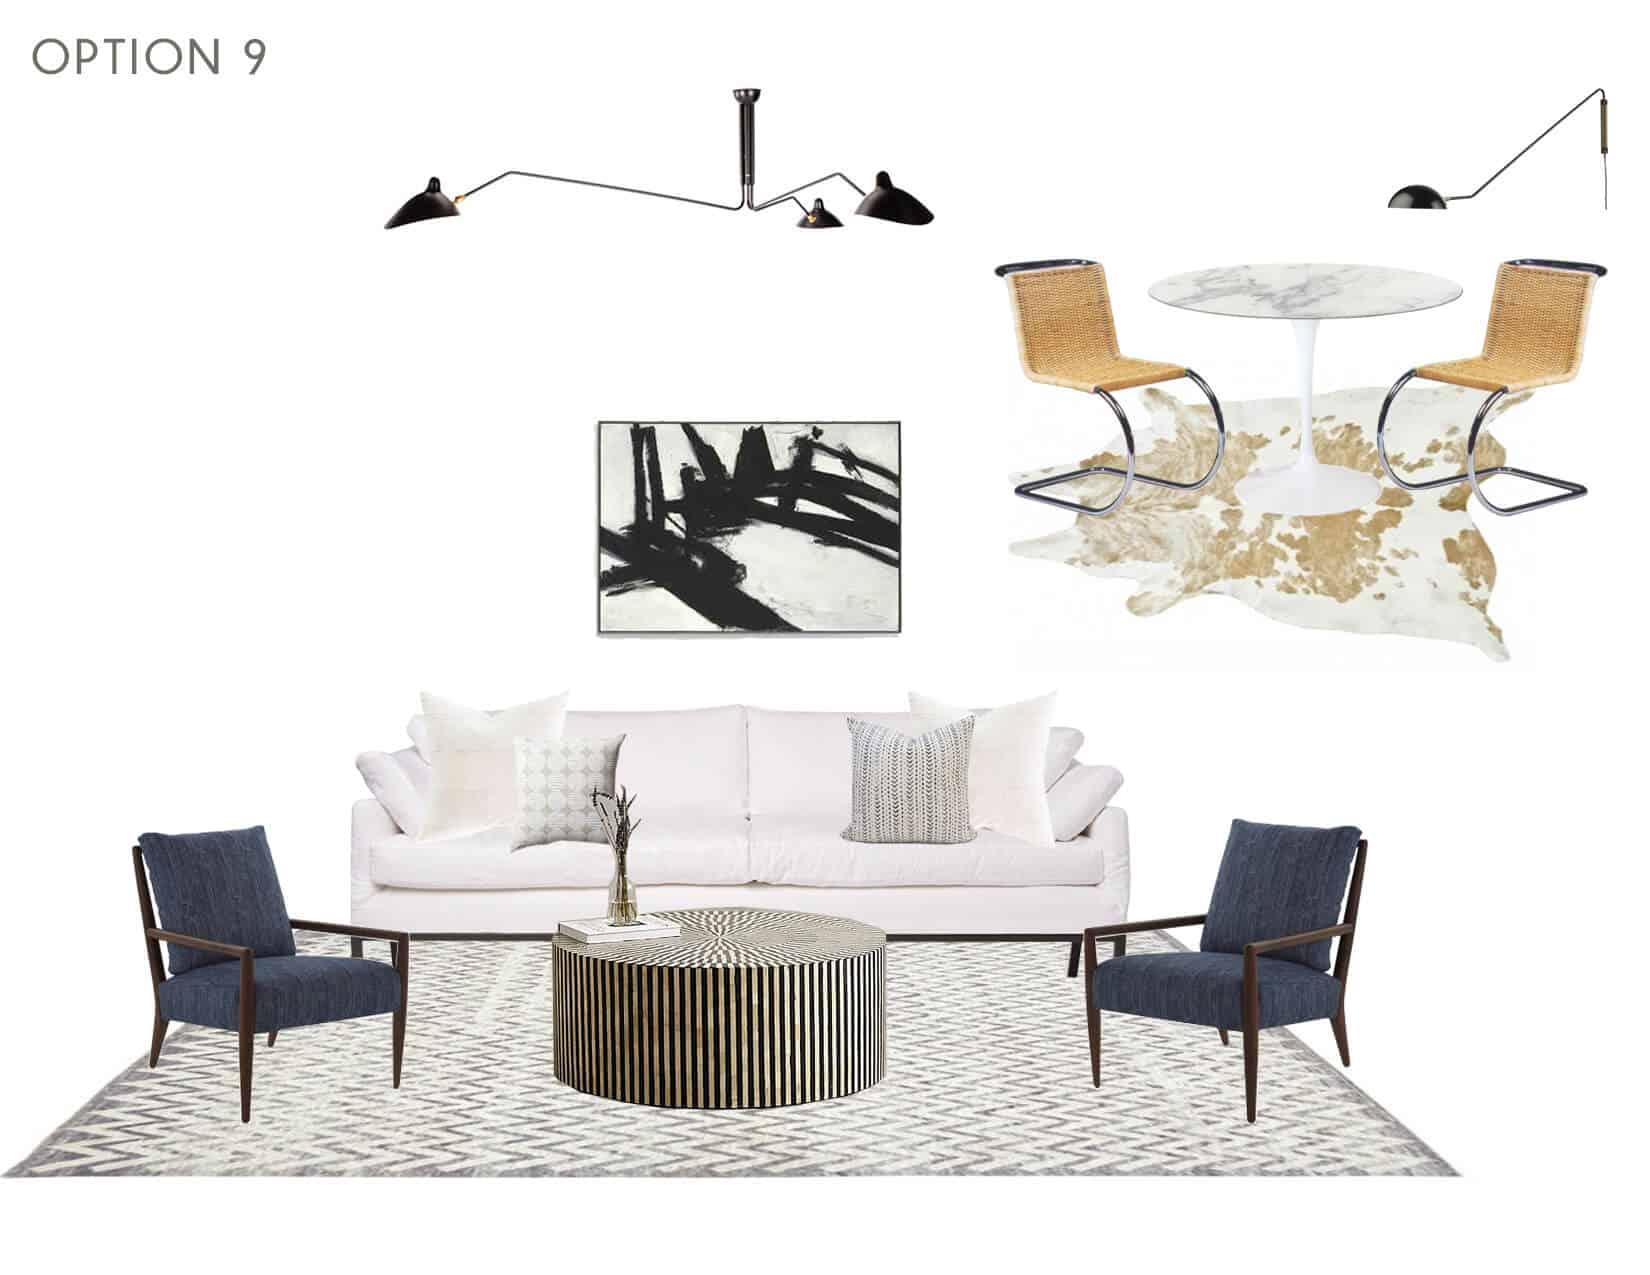 Emily Henderson_Full Design_Sunroom_Introduction_Moodboard_Option 9